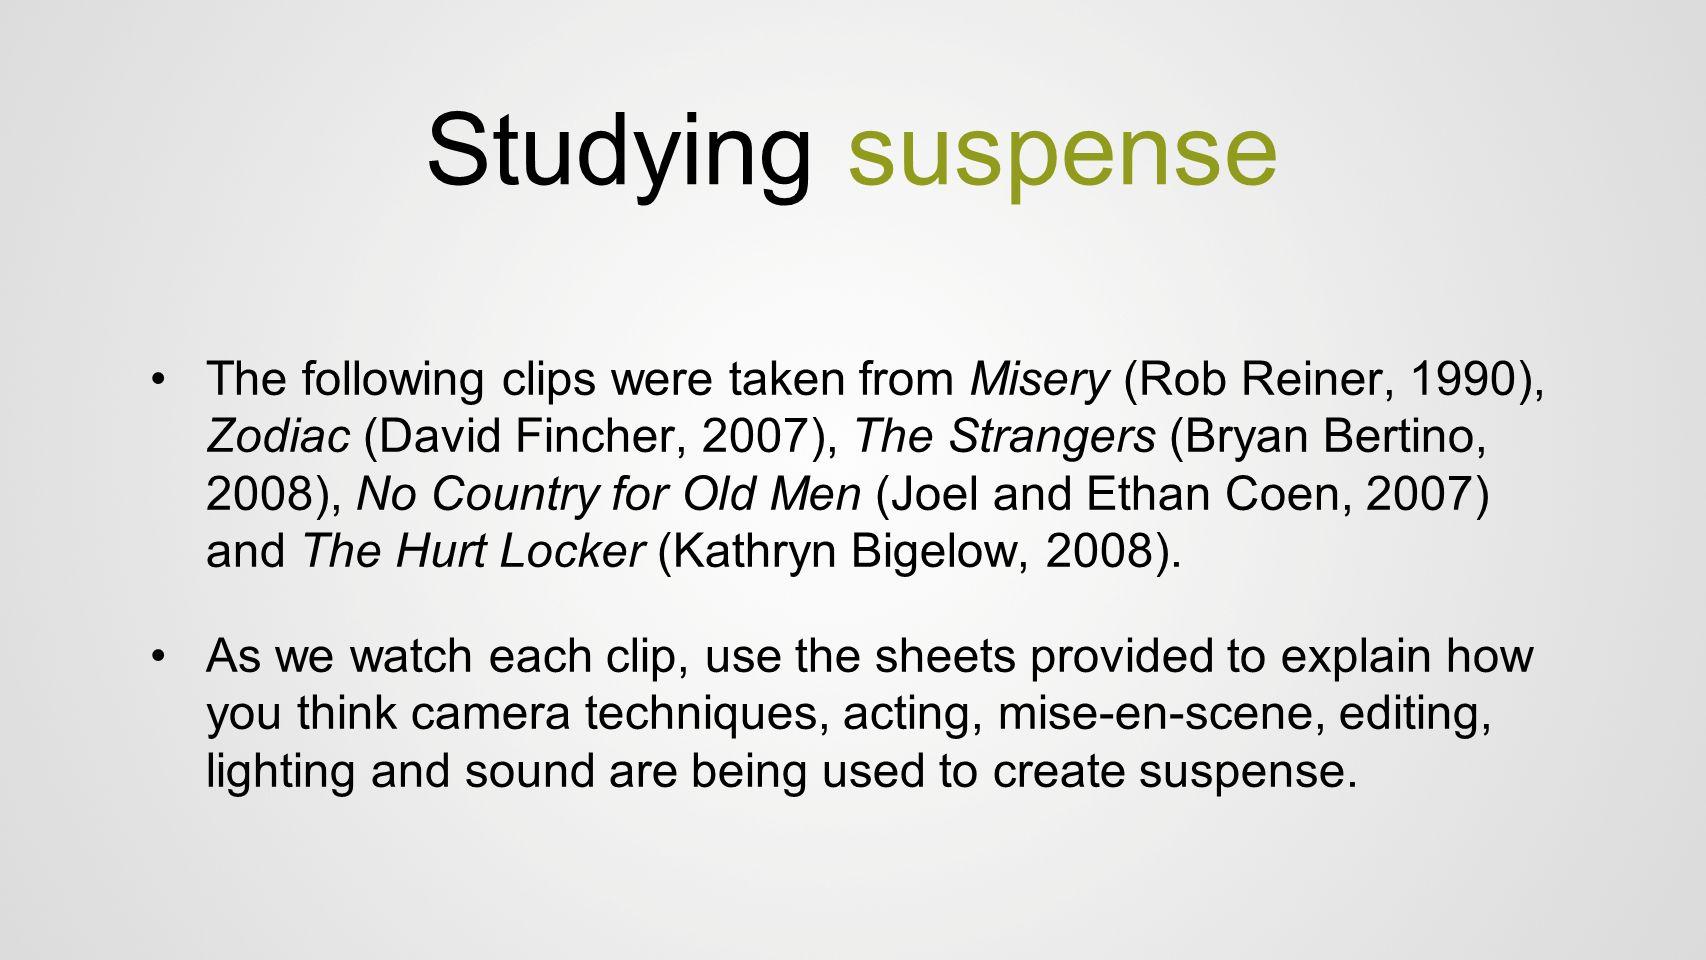 Studying suspense